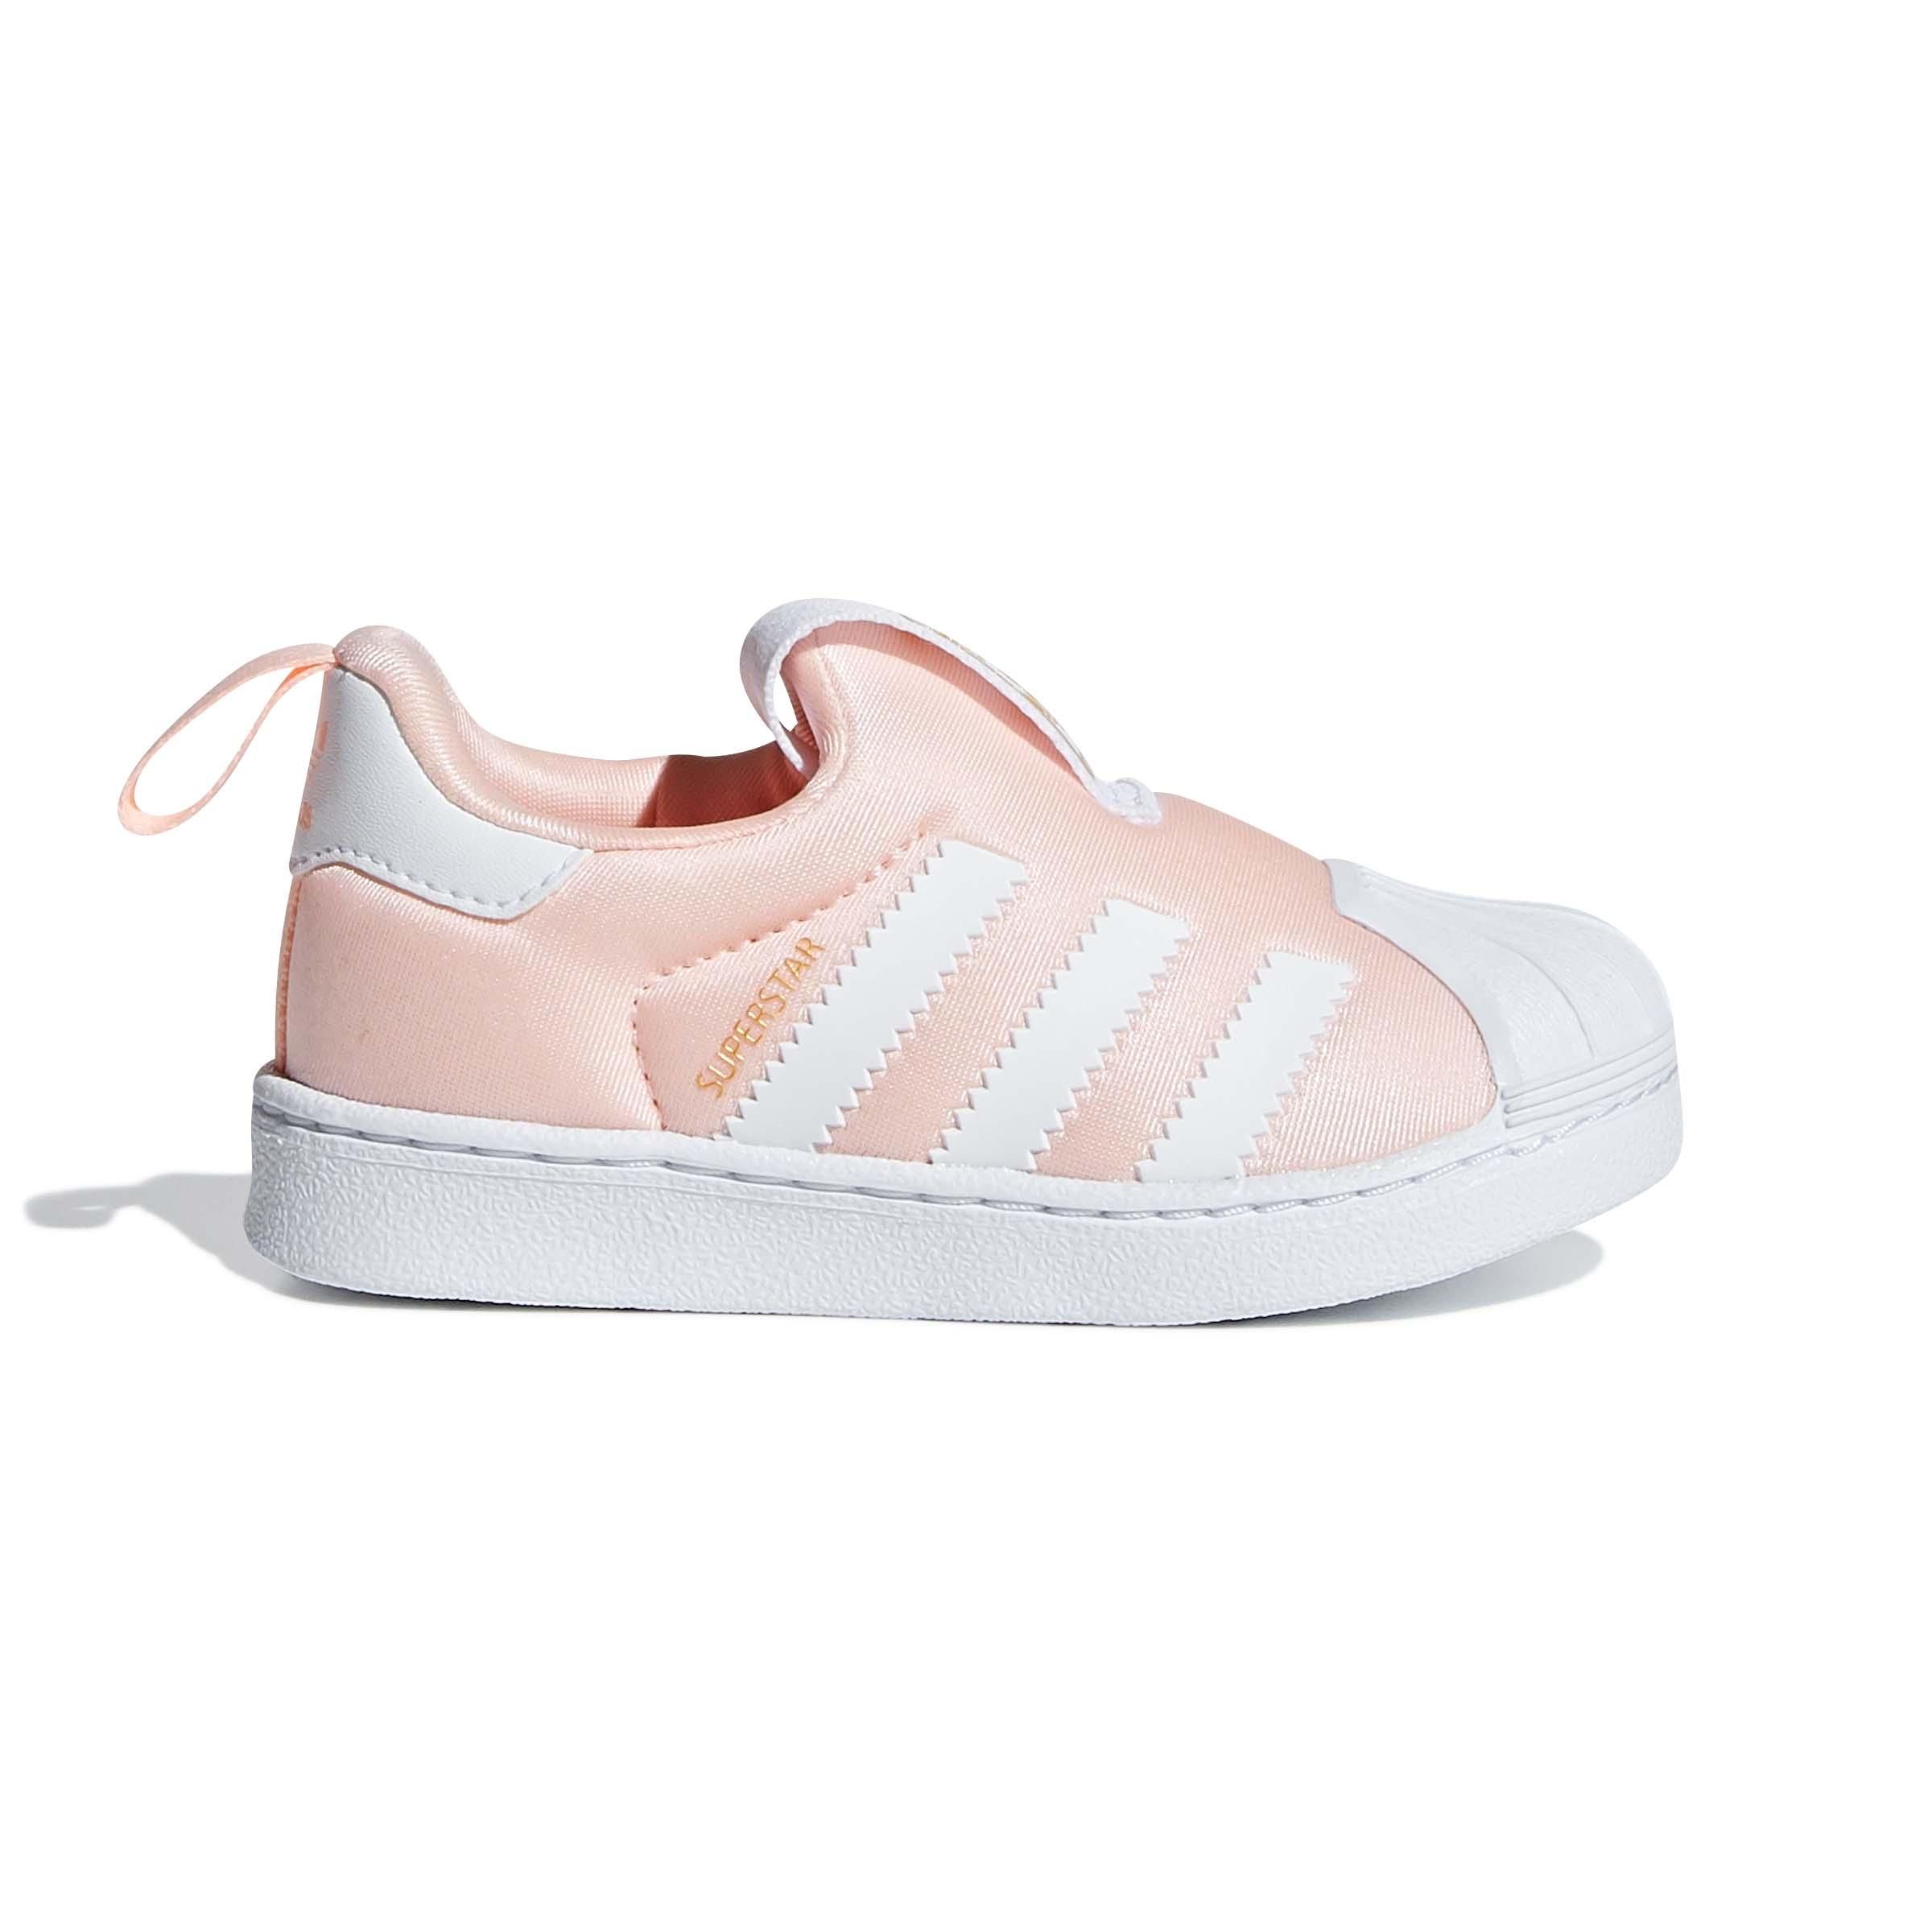 Adidas תינוקות // Superstar 360 Clear Orange